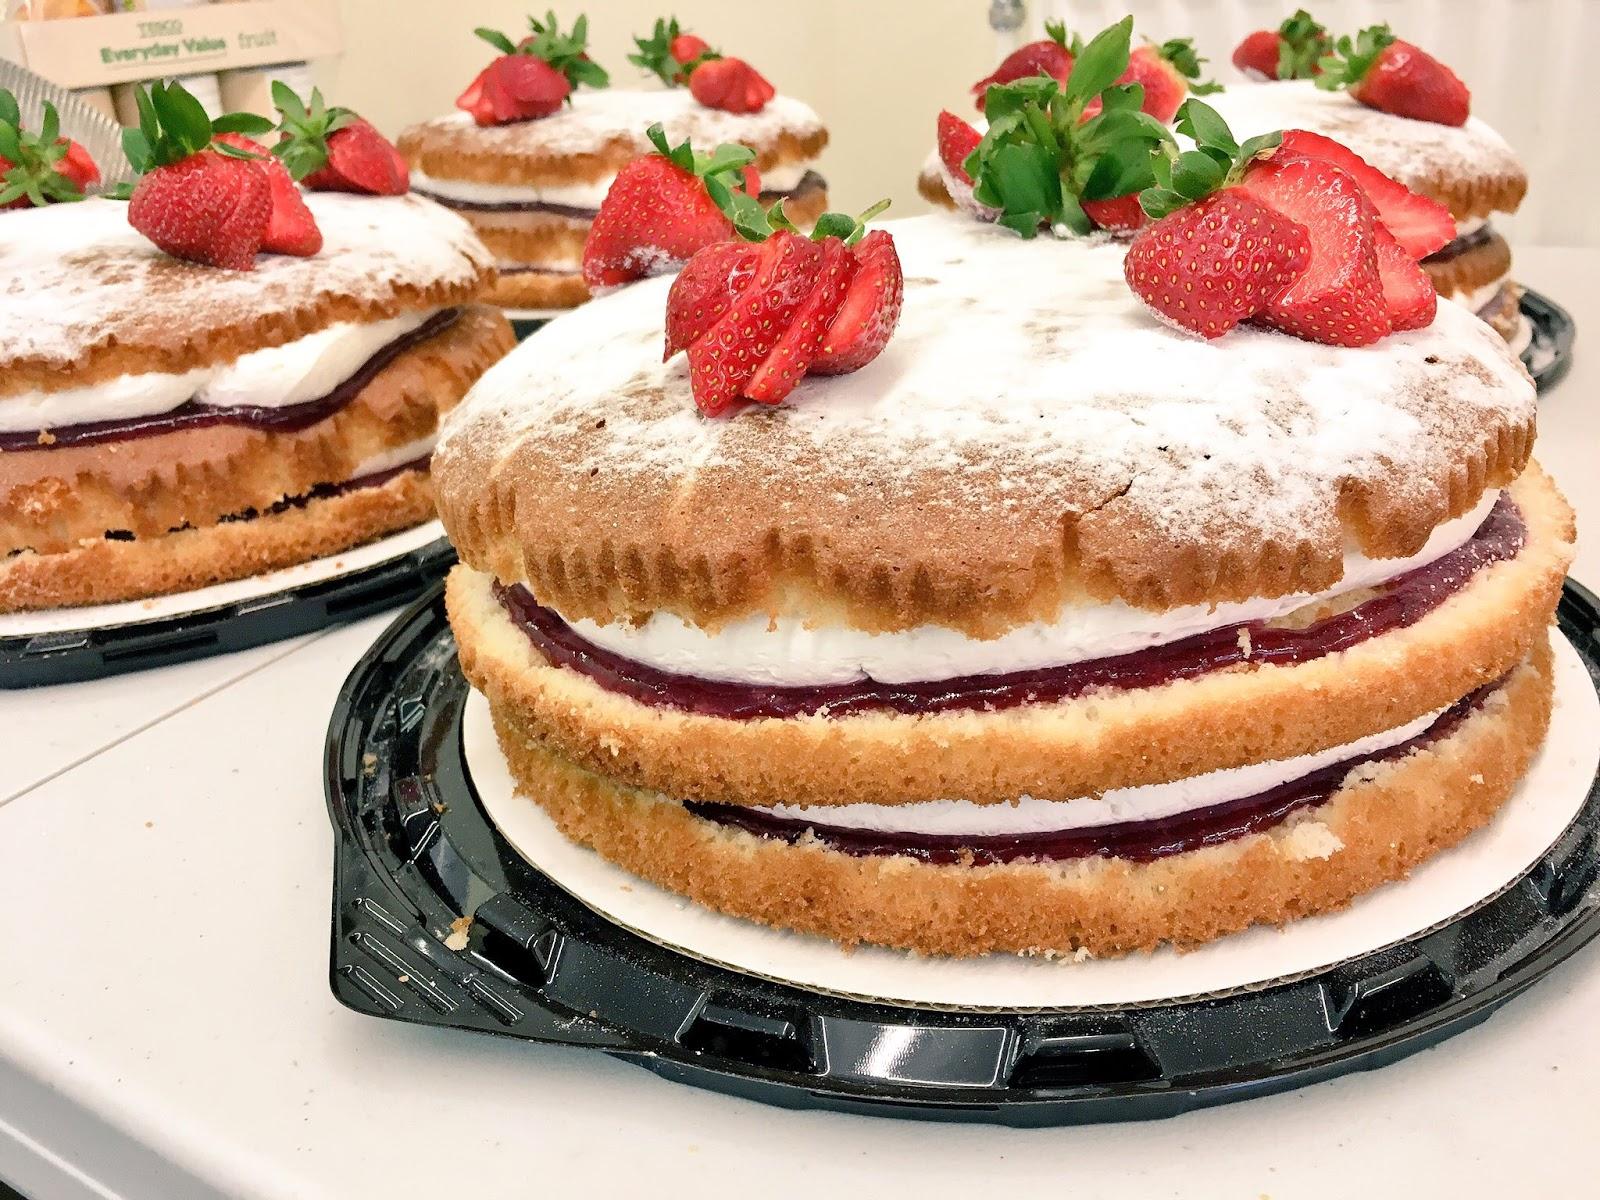 Diabetic Sponge Cake Recipes Uk: Community Dine With Me Cardiff